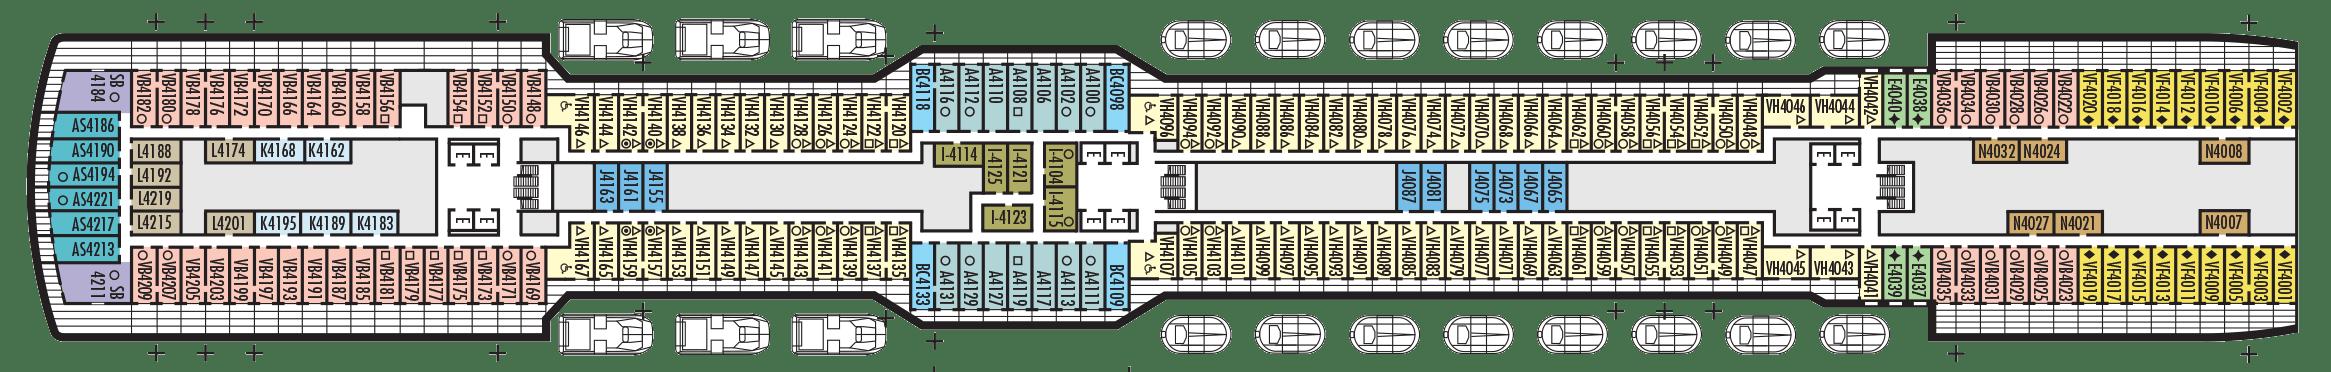 Koningsdam Deck Plan  Holland America Line